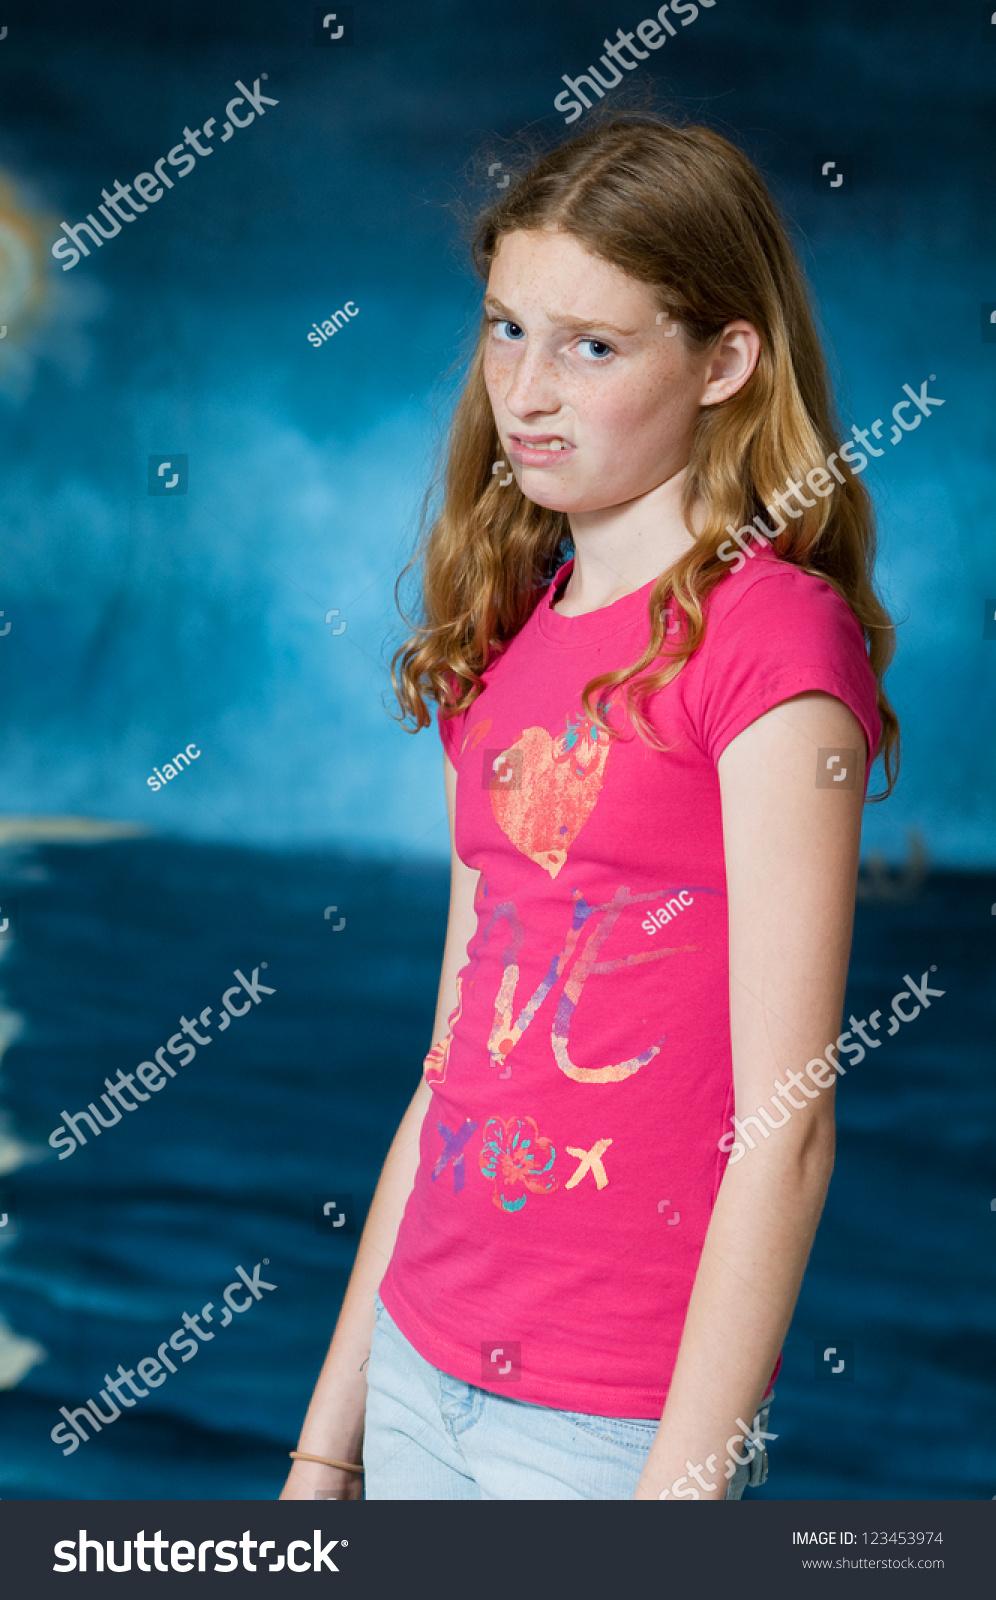 Teenage Girl Bad Attitude Stock Photo 123453974 - Shutterstock